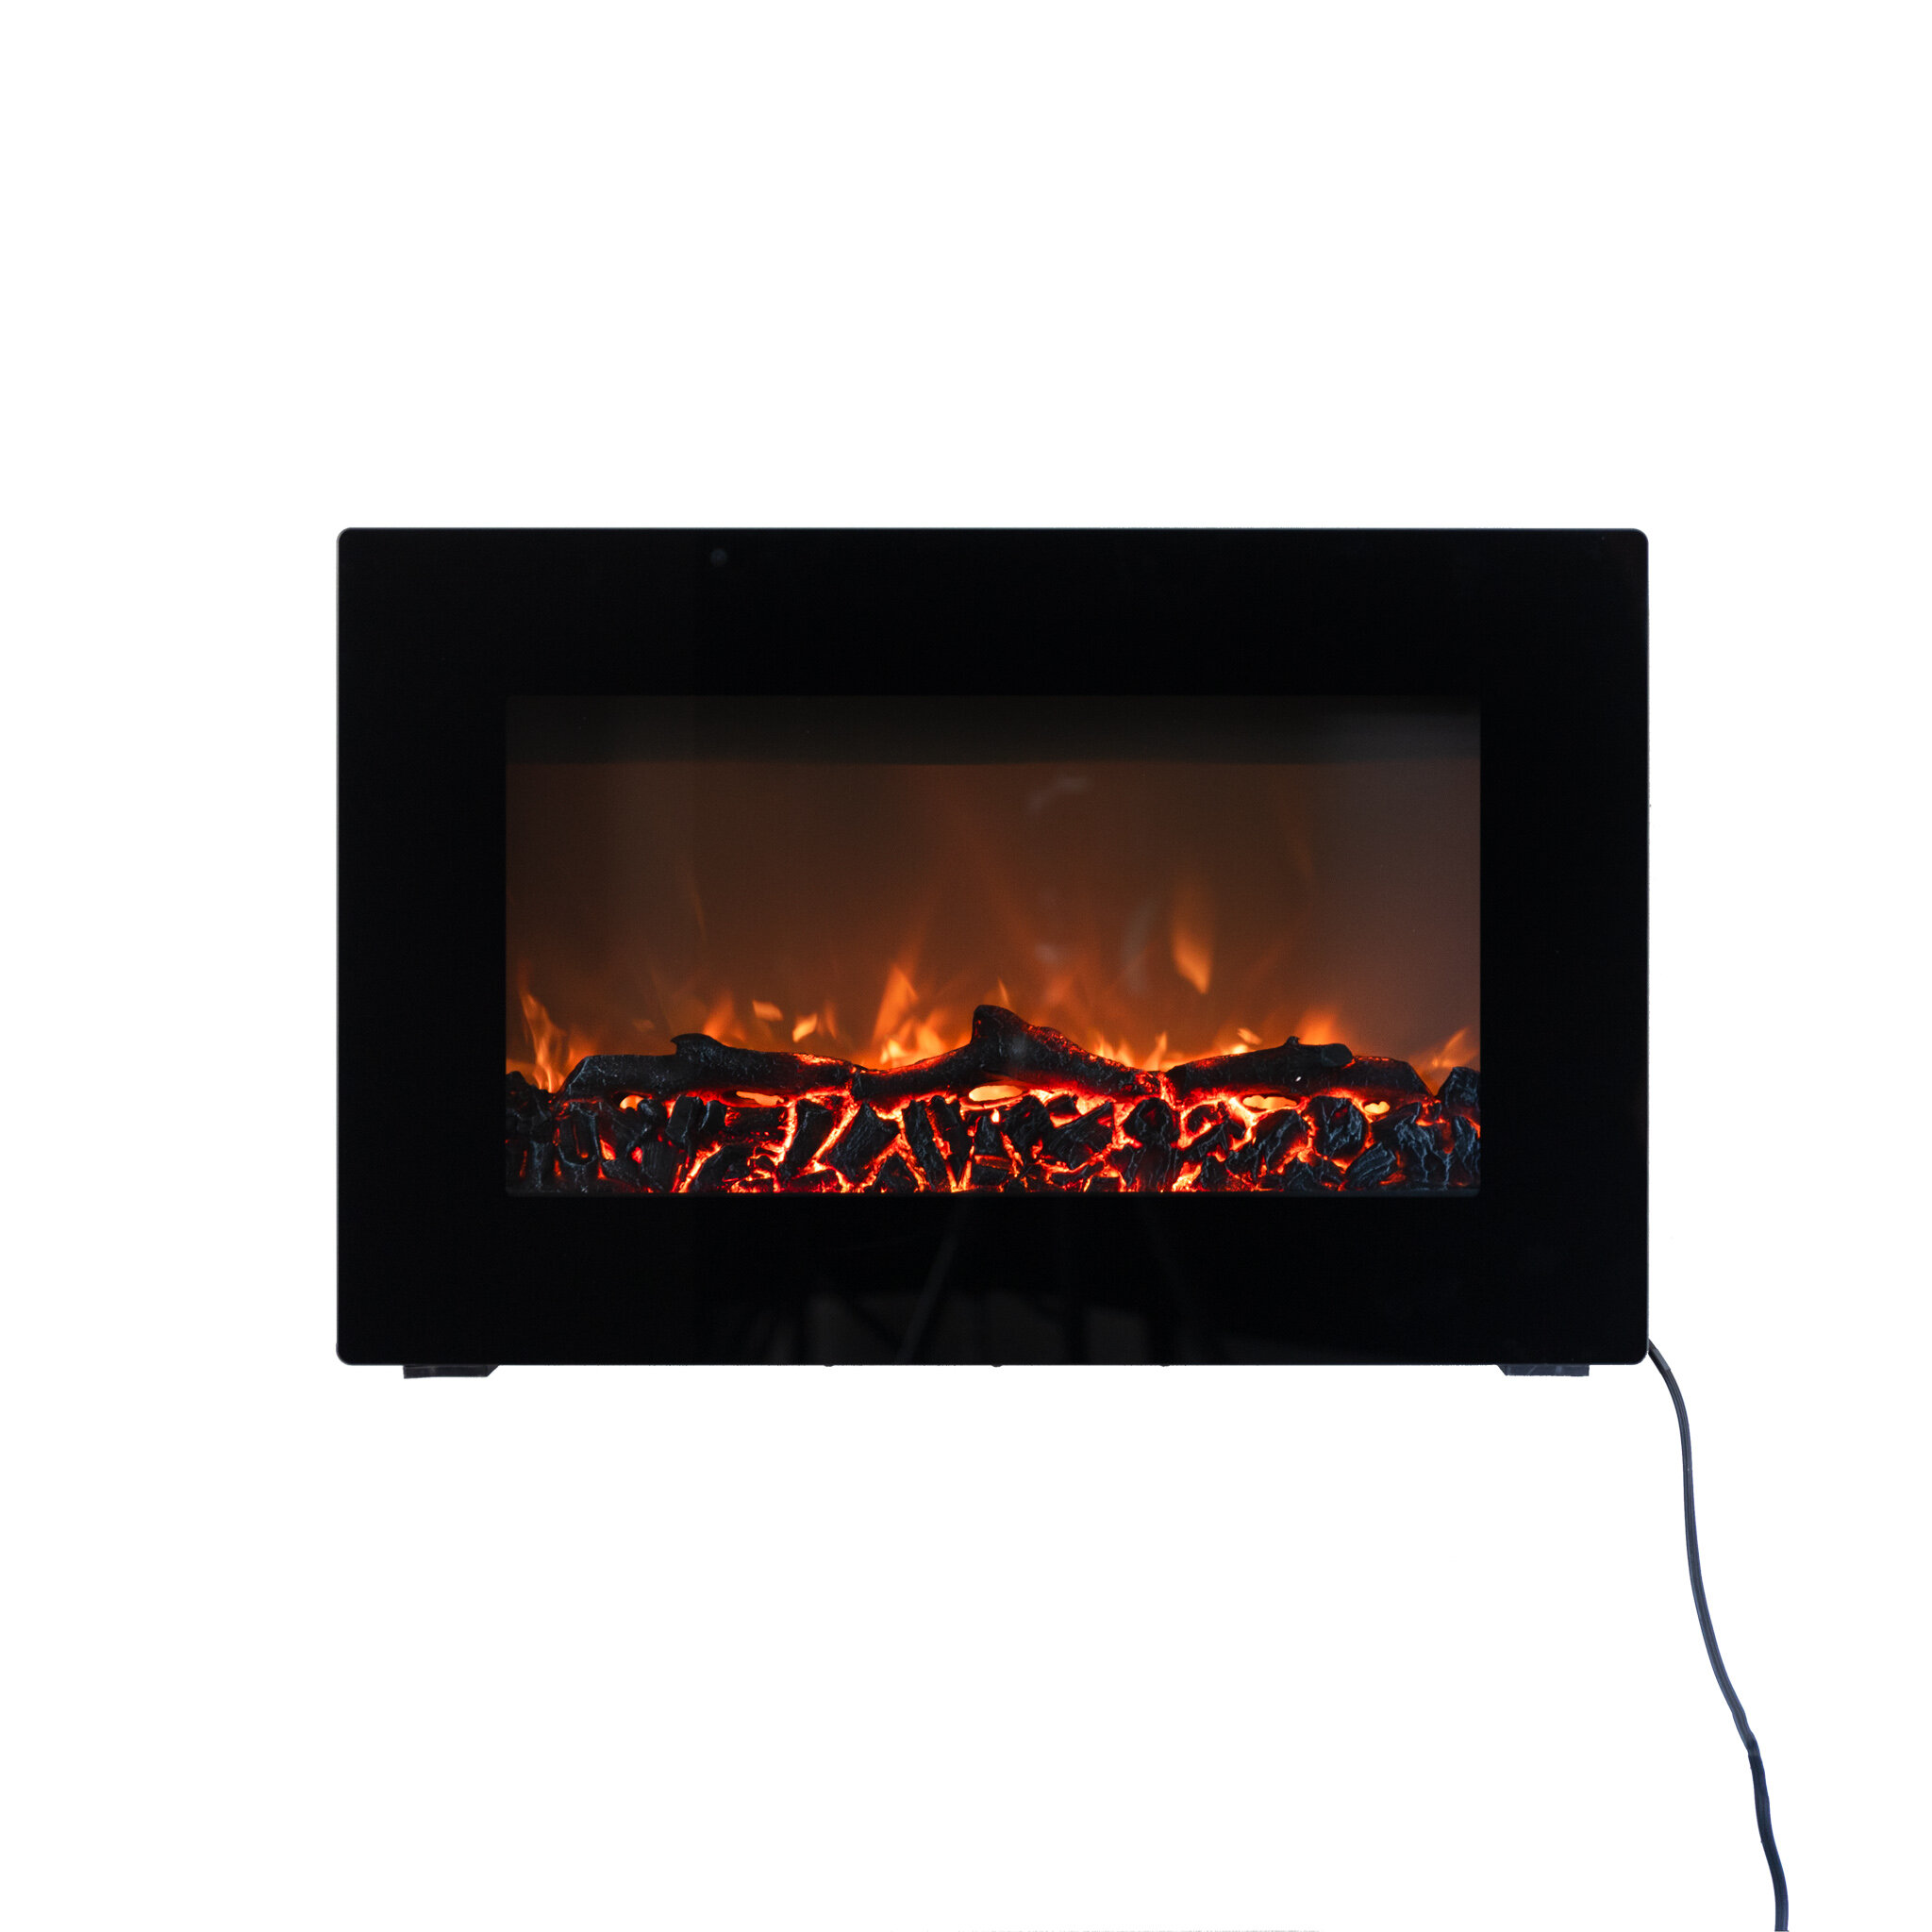 Surprising Arturo Wall Mounted Electric Fireplace Home Interior And Landscaping Analalmasignezvosmurscom